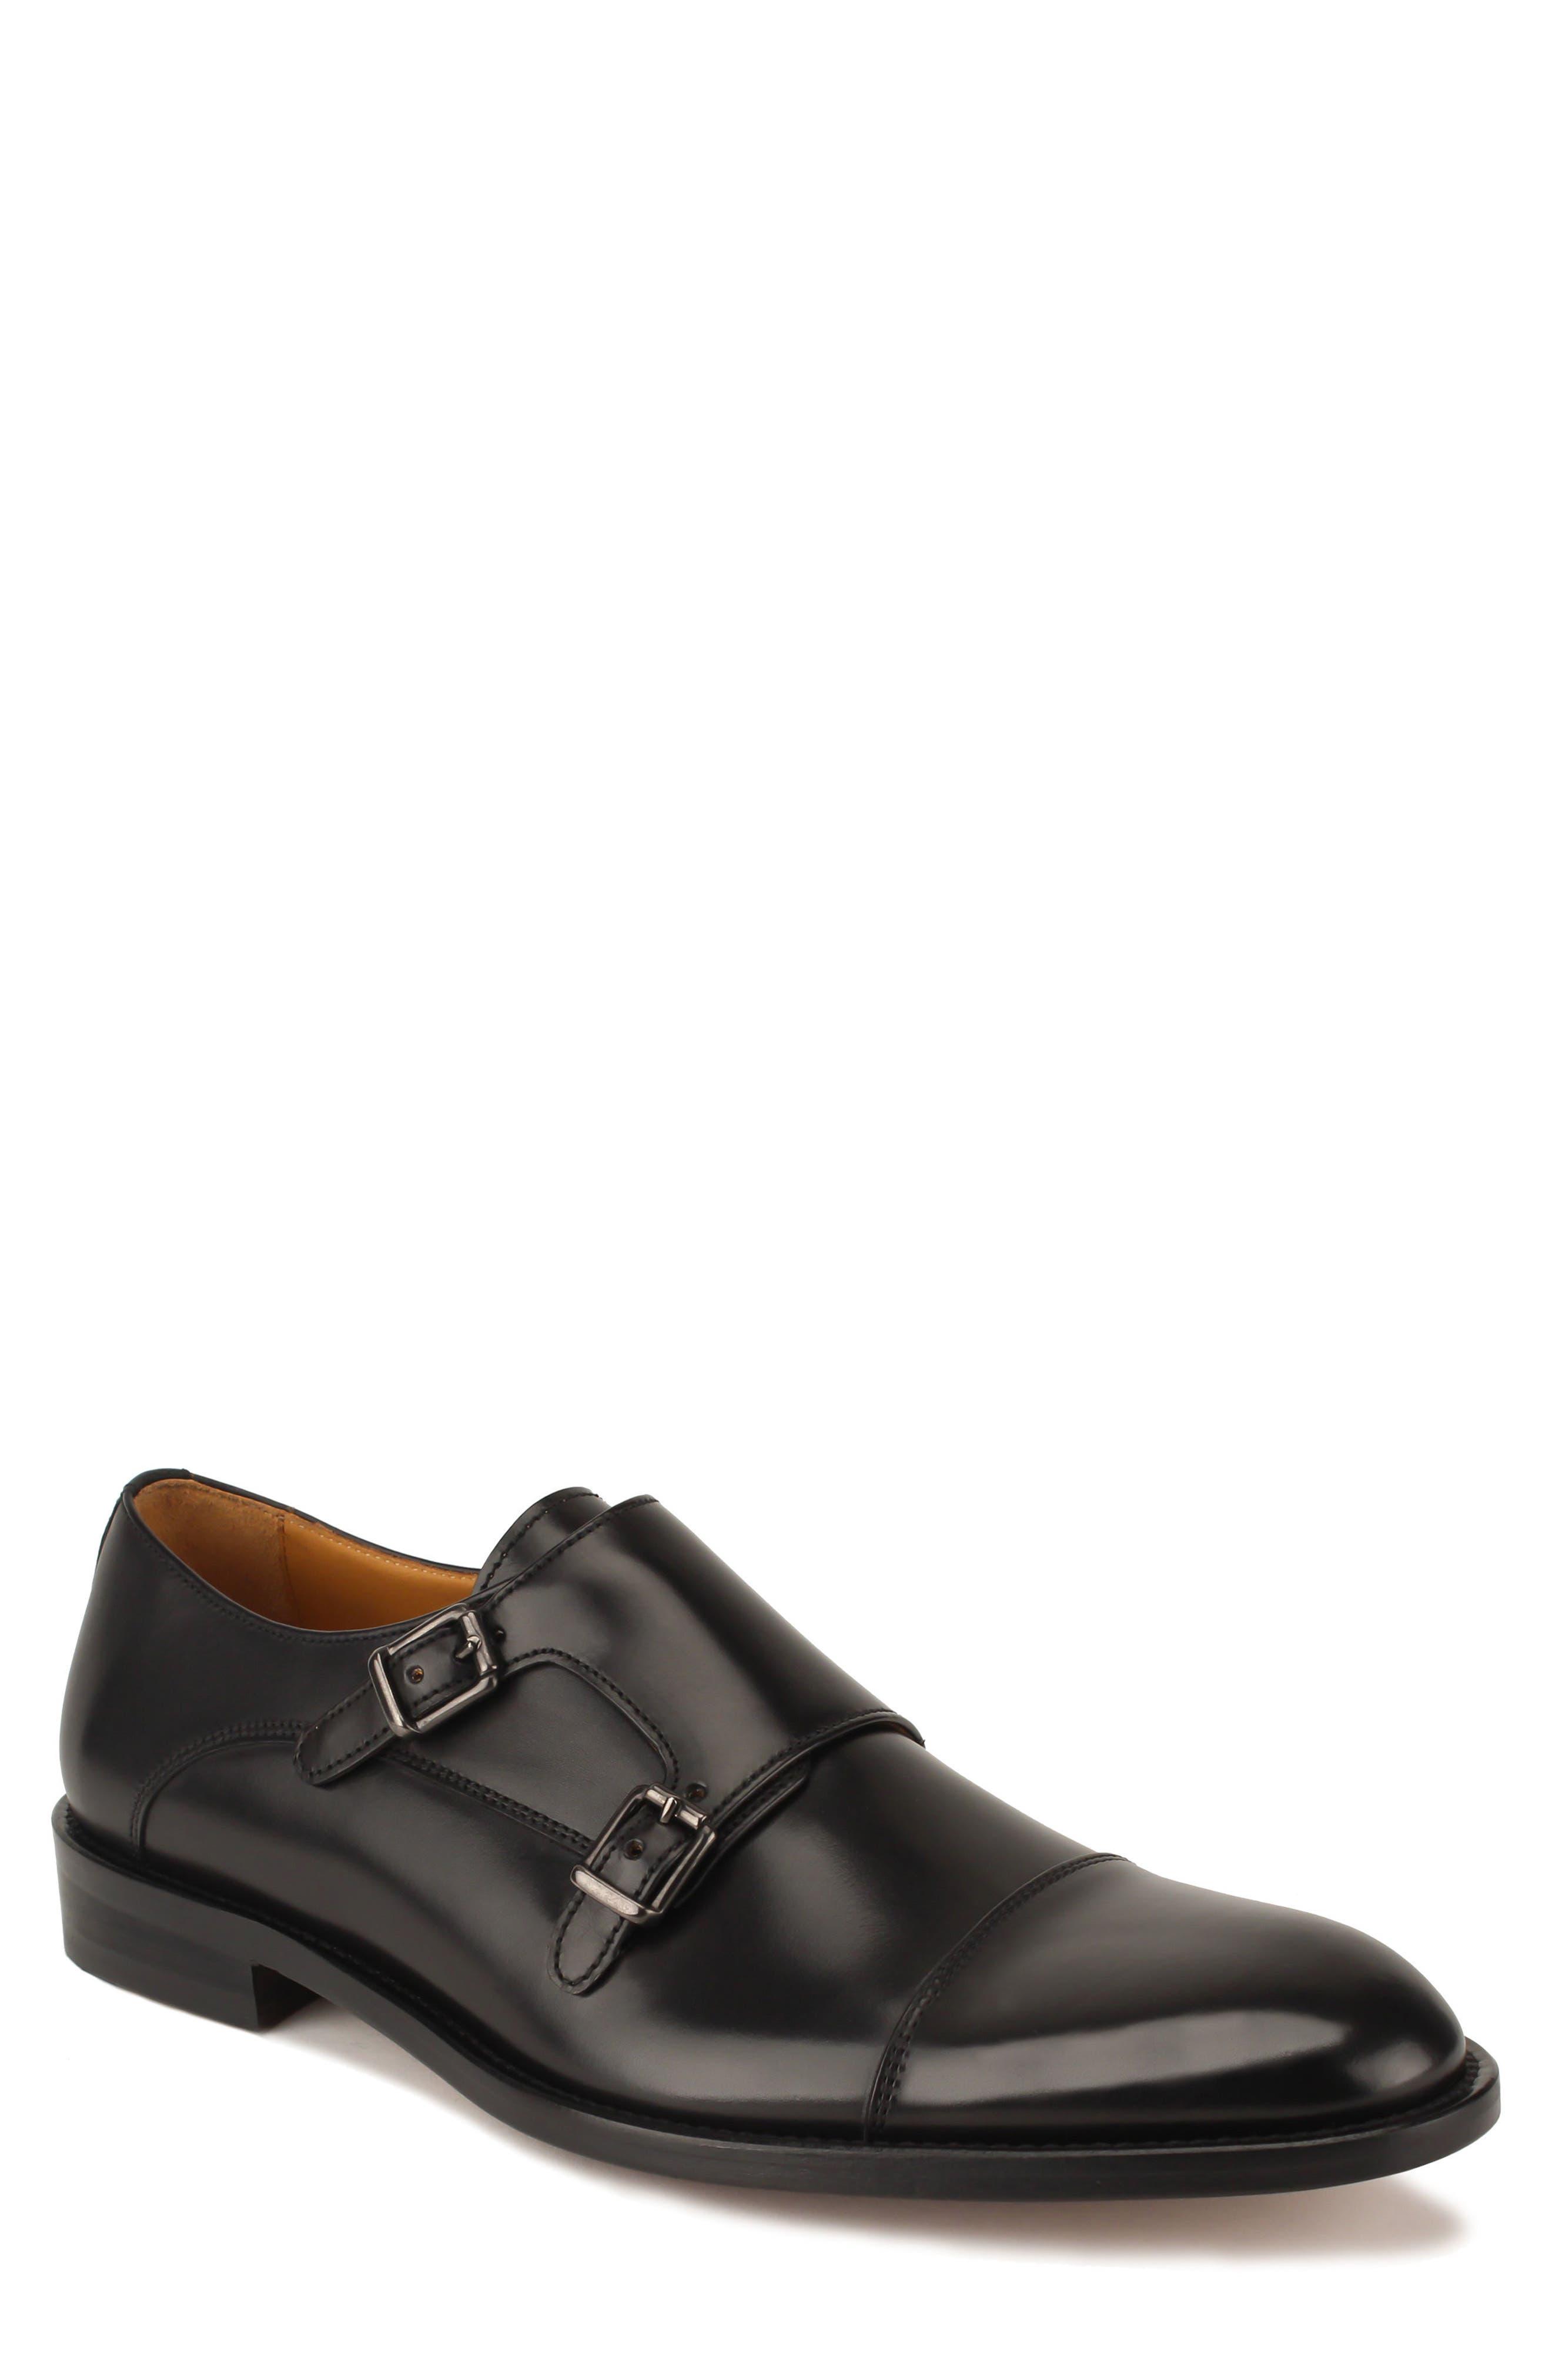 Jay Double Monk Strap Shoe,                         Main,                         color, BLACK LEATHER